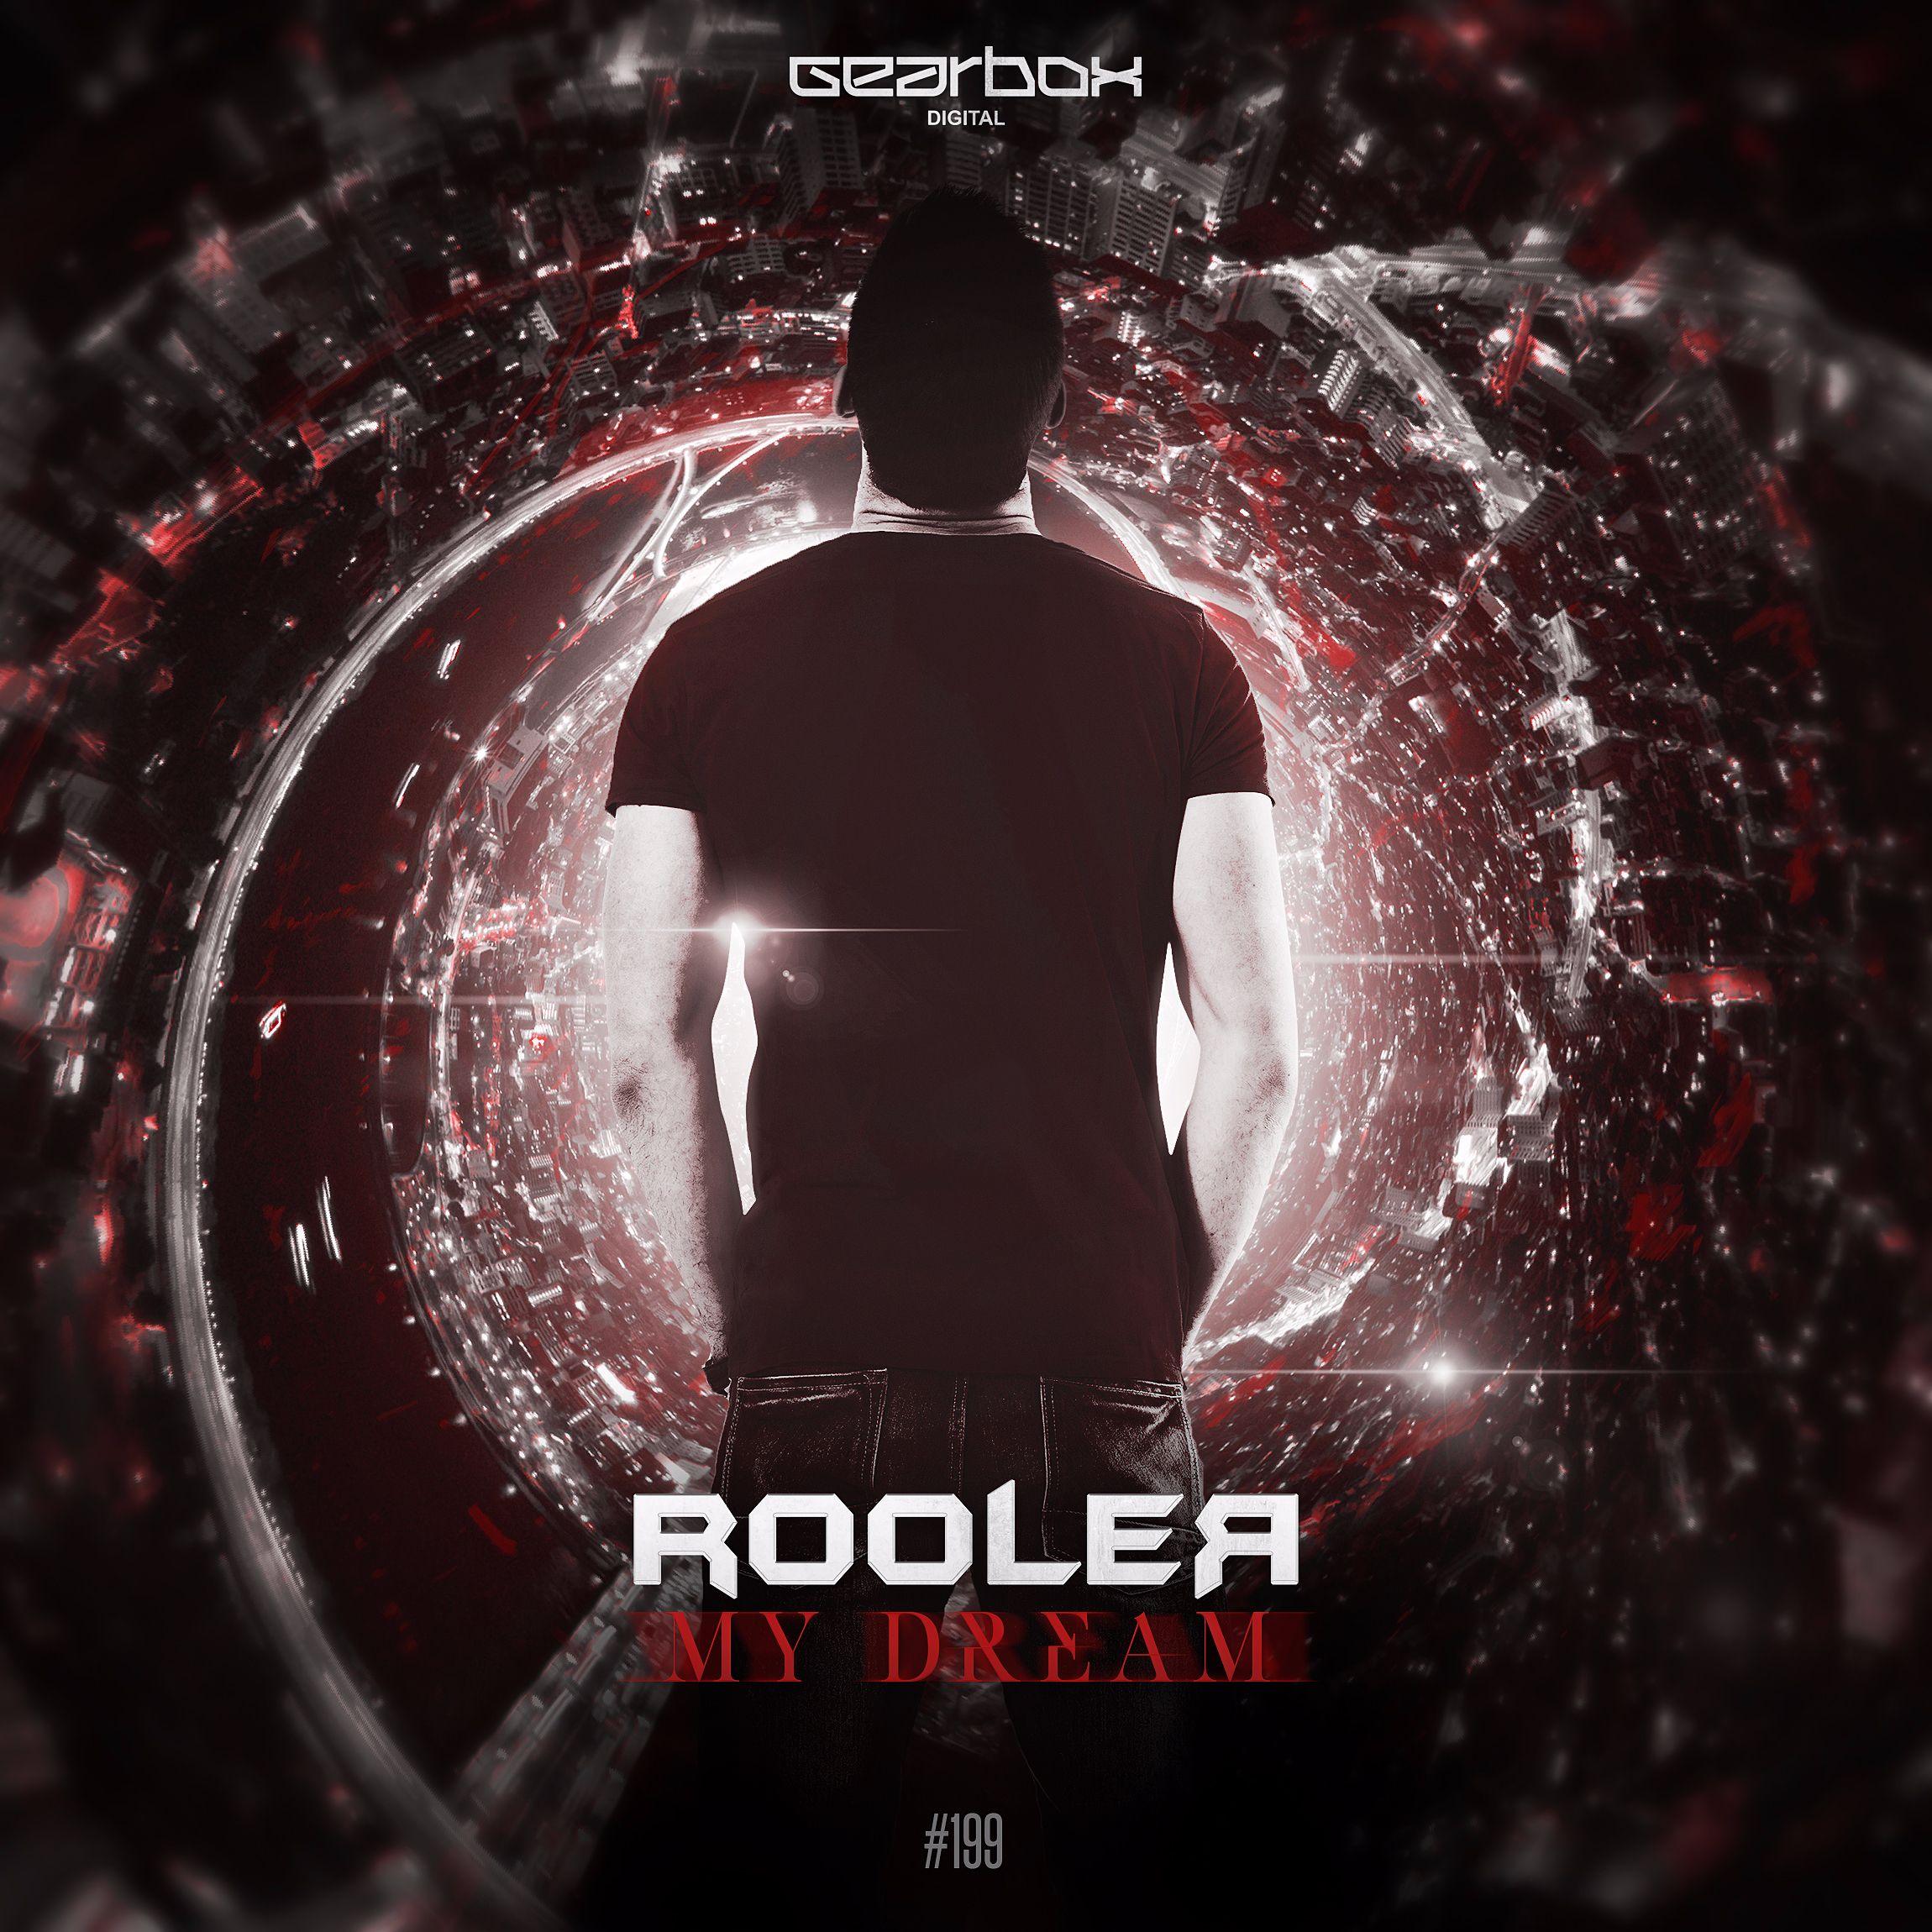 Rooler - My Dream [GEARBOX DIGITAL] GBD199